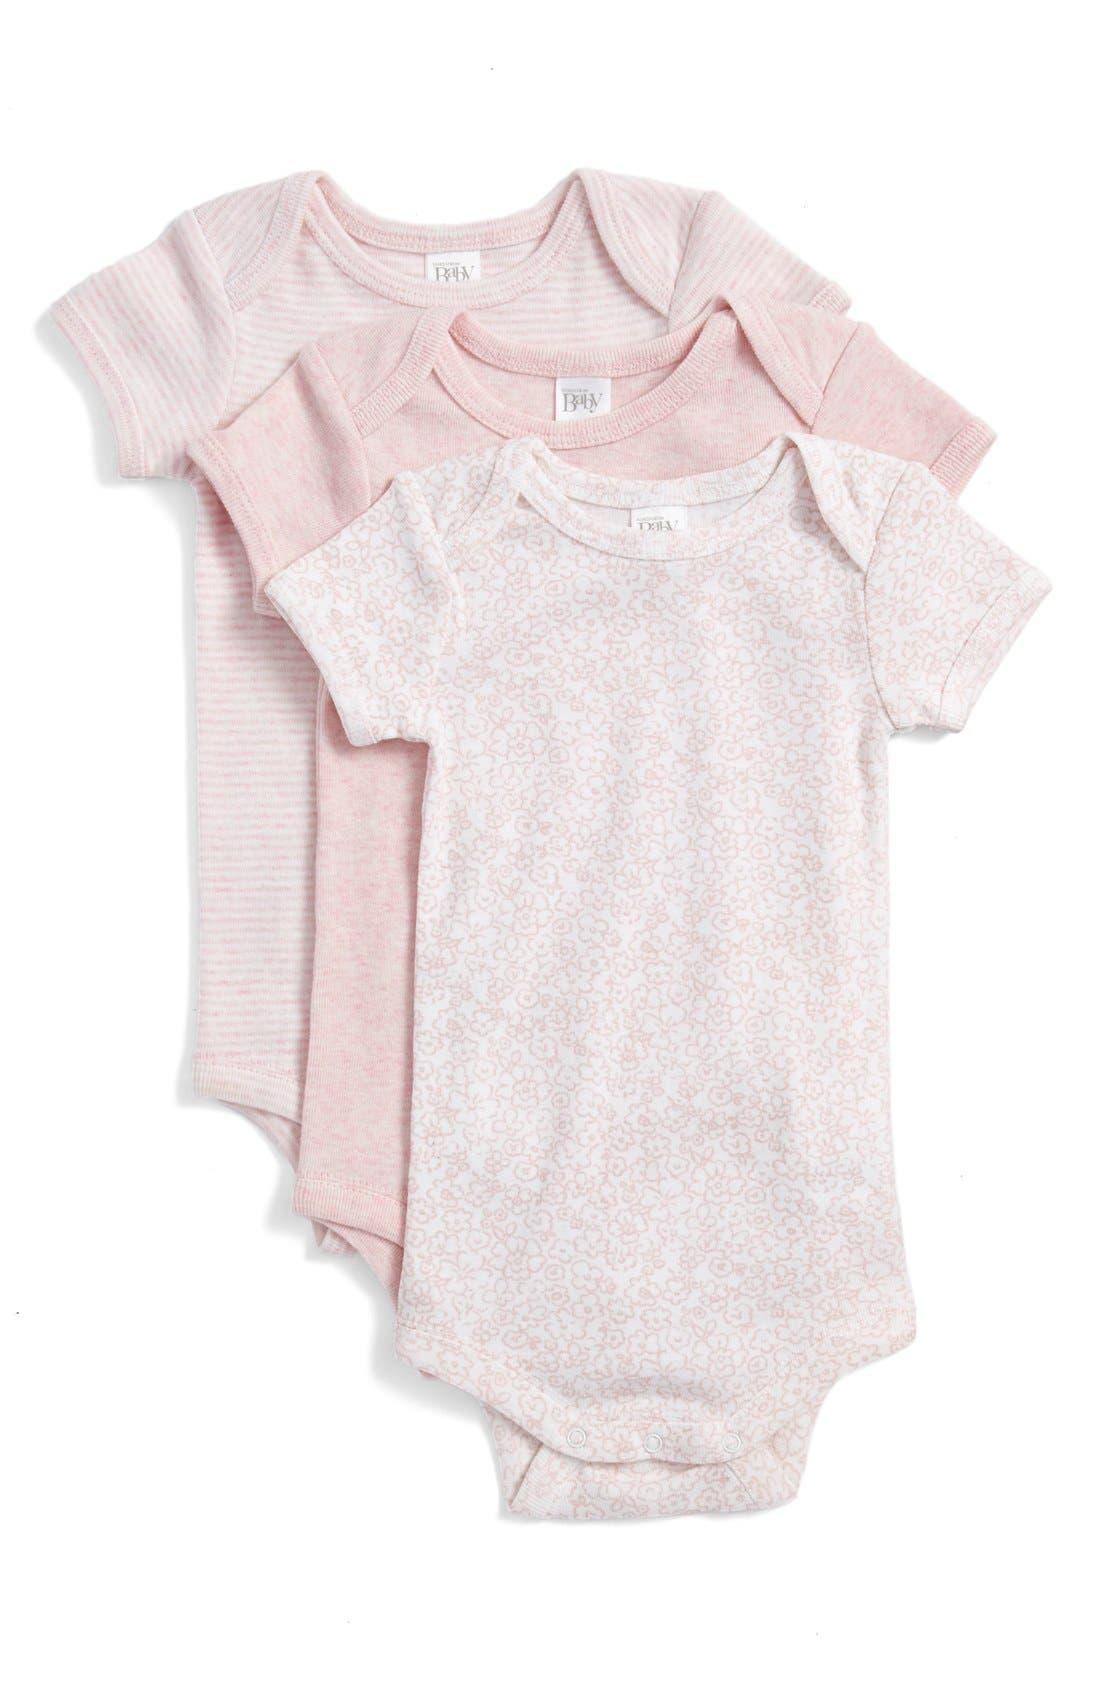 Alternate Image 1 Selected - Nordstrom Baby Short Sleeve Cotton Bodysuits (3-Pack) (Baby Girls)